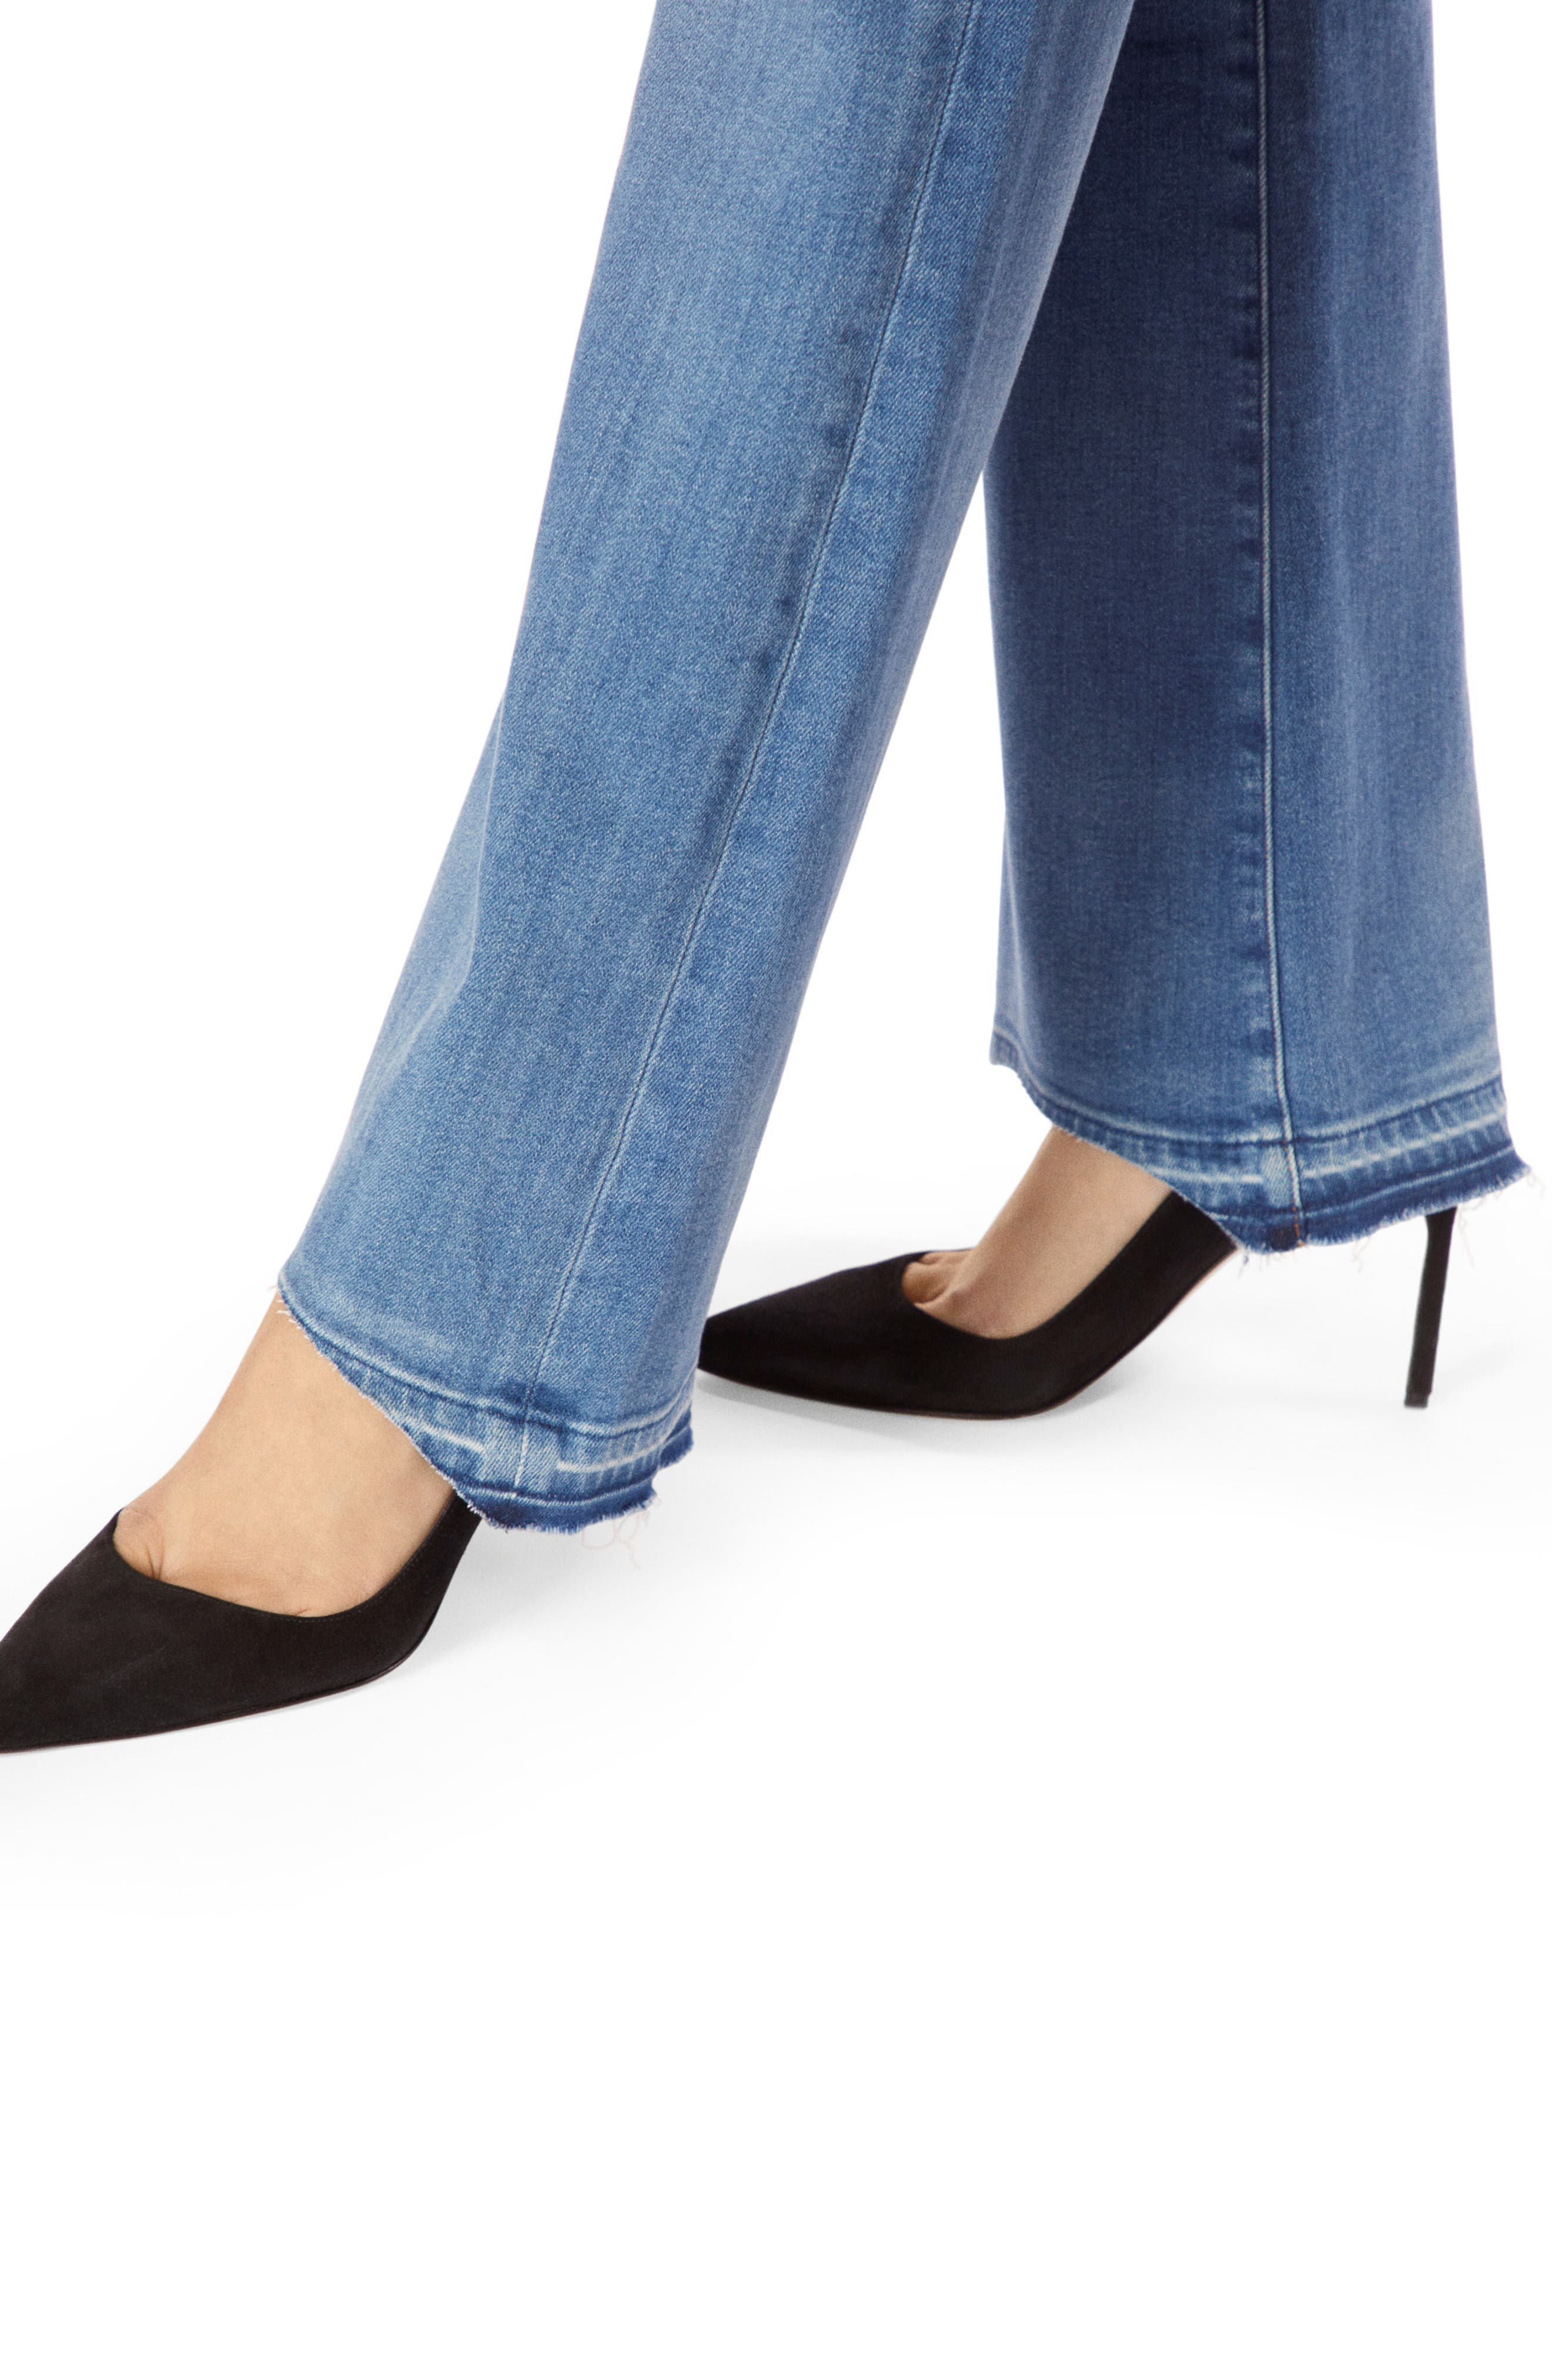 Sallie Release Hem Bootcut Jeans,                             Alternate thumbnail 4, color,                             RADIATE